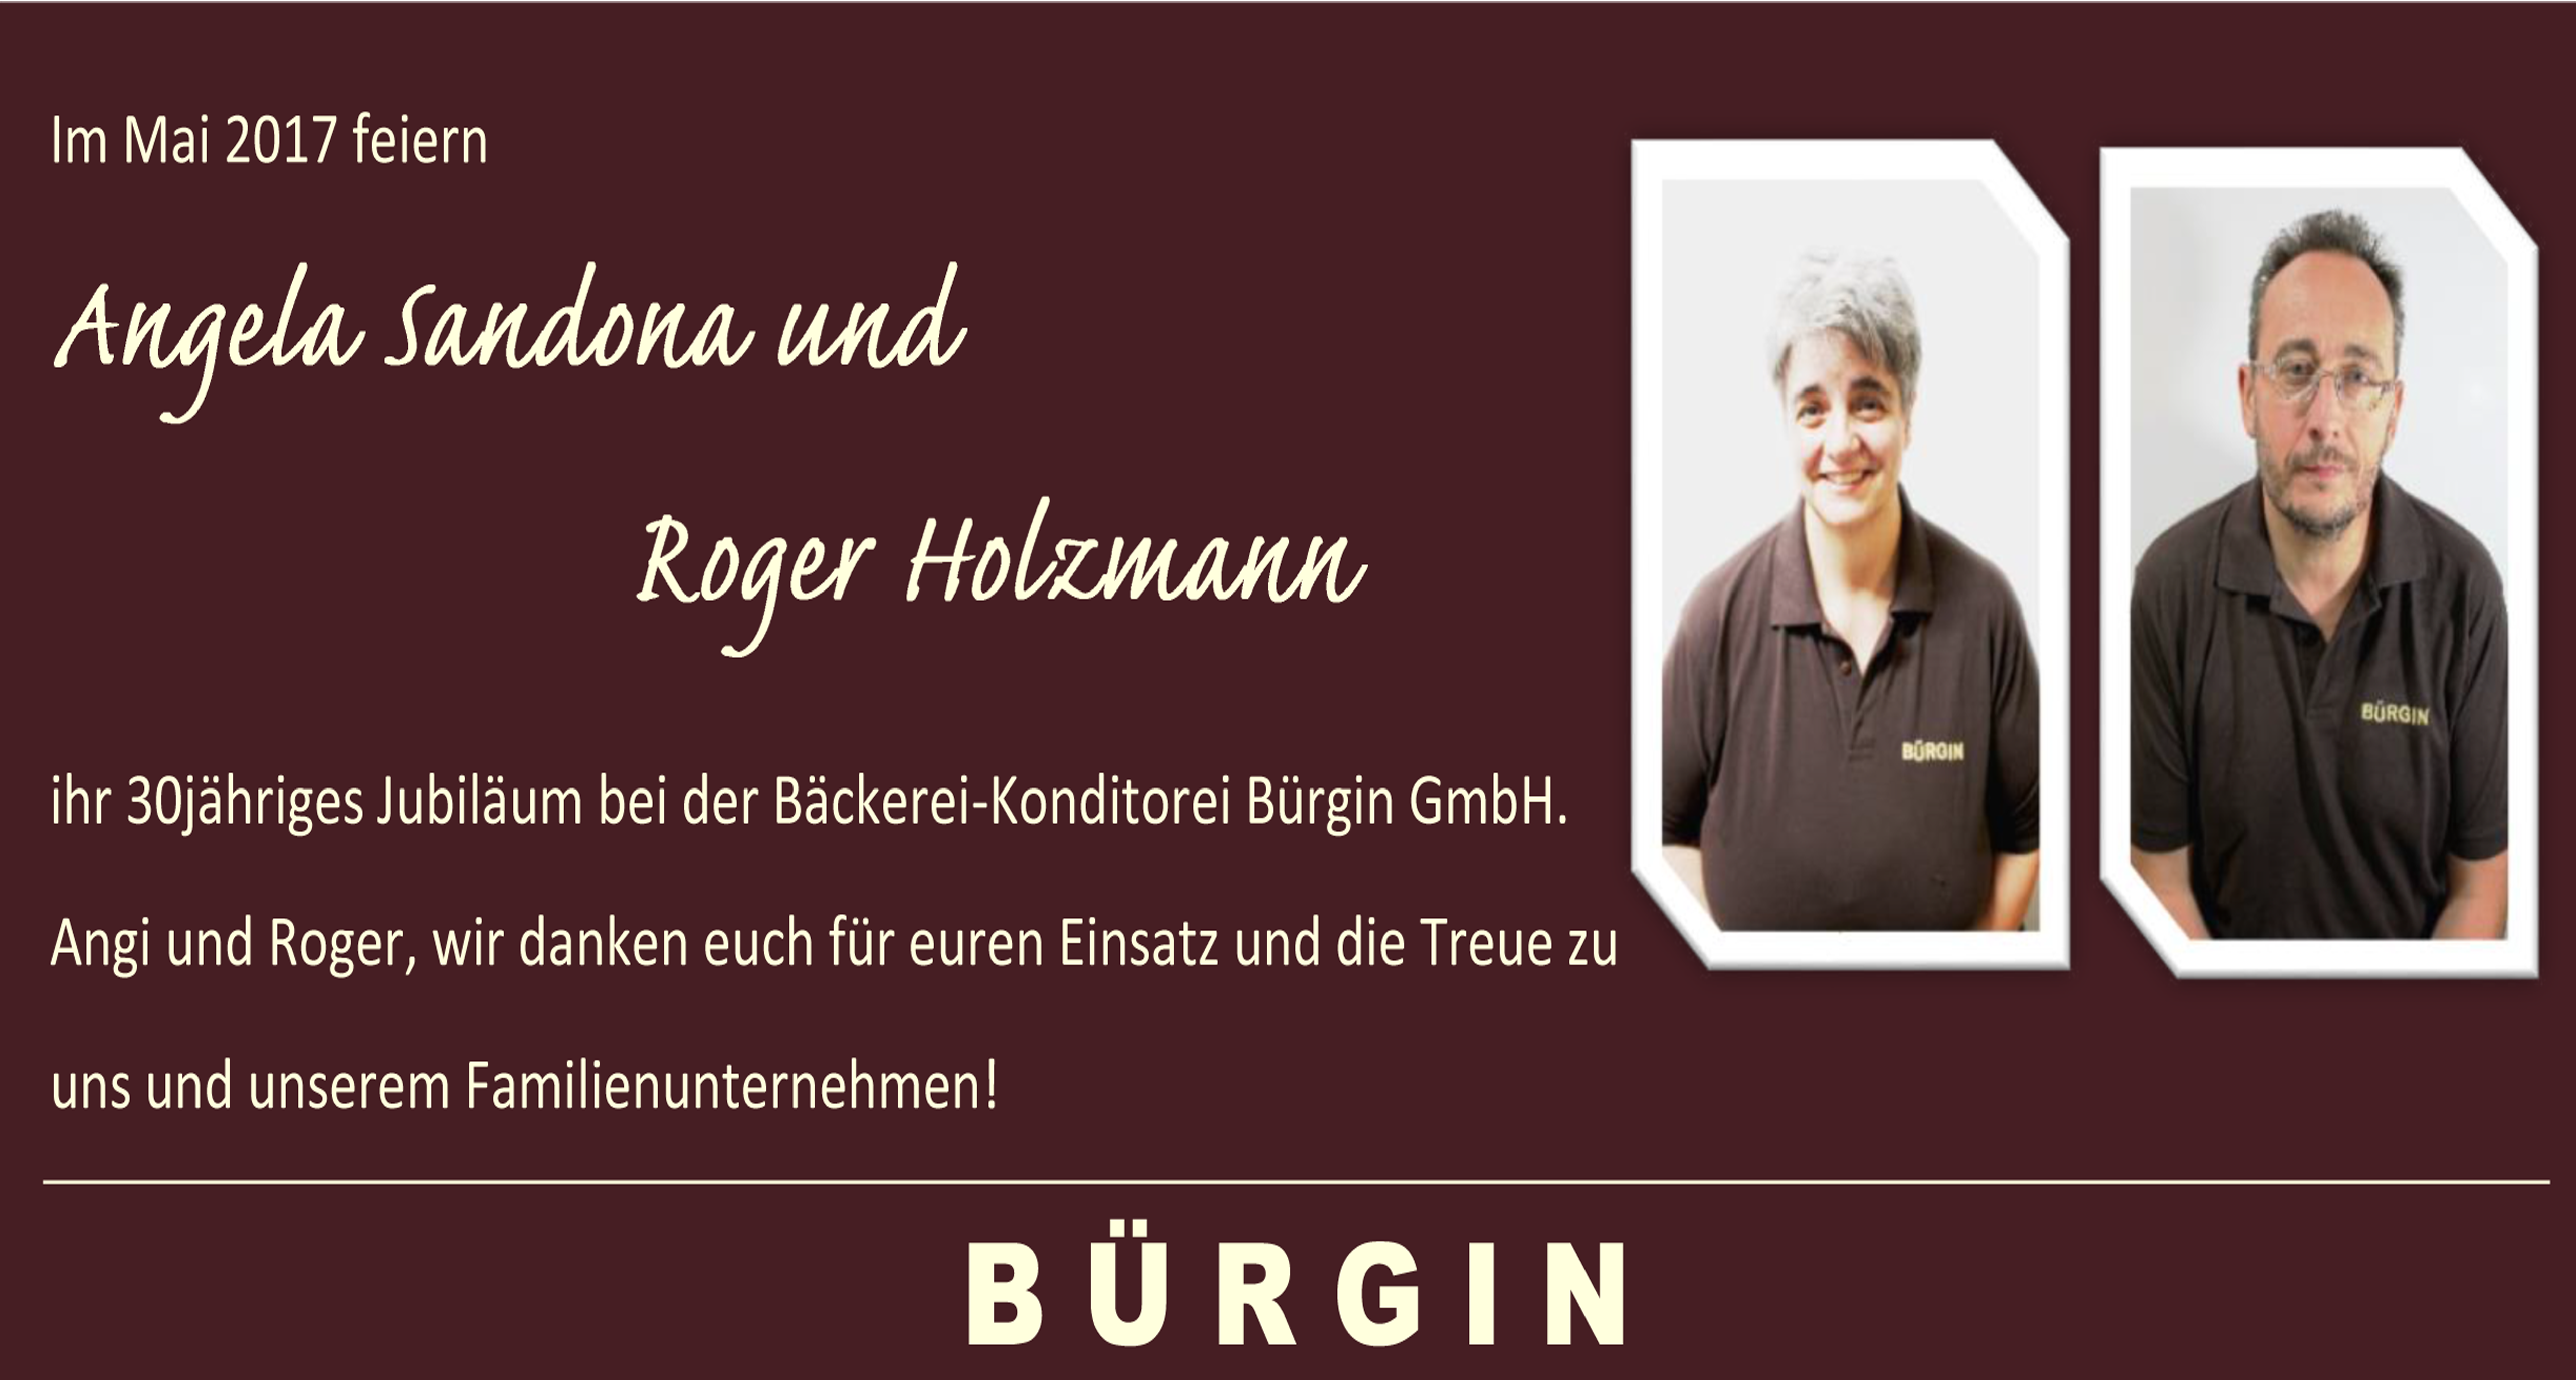 Buergin_Baeckerei_Kreuzlingen_Angela_Roger,_Jubiläum